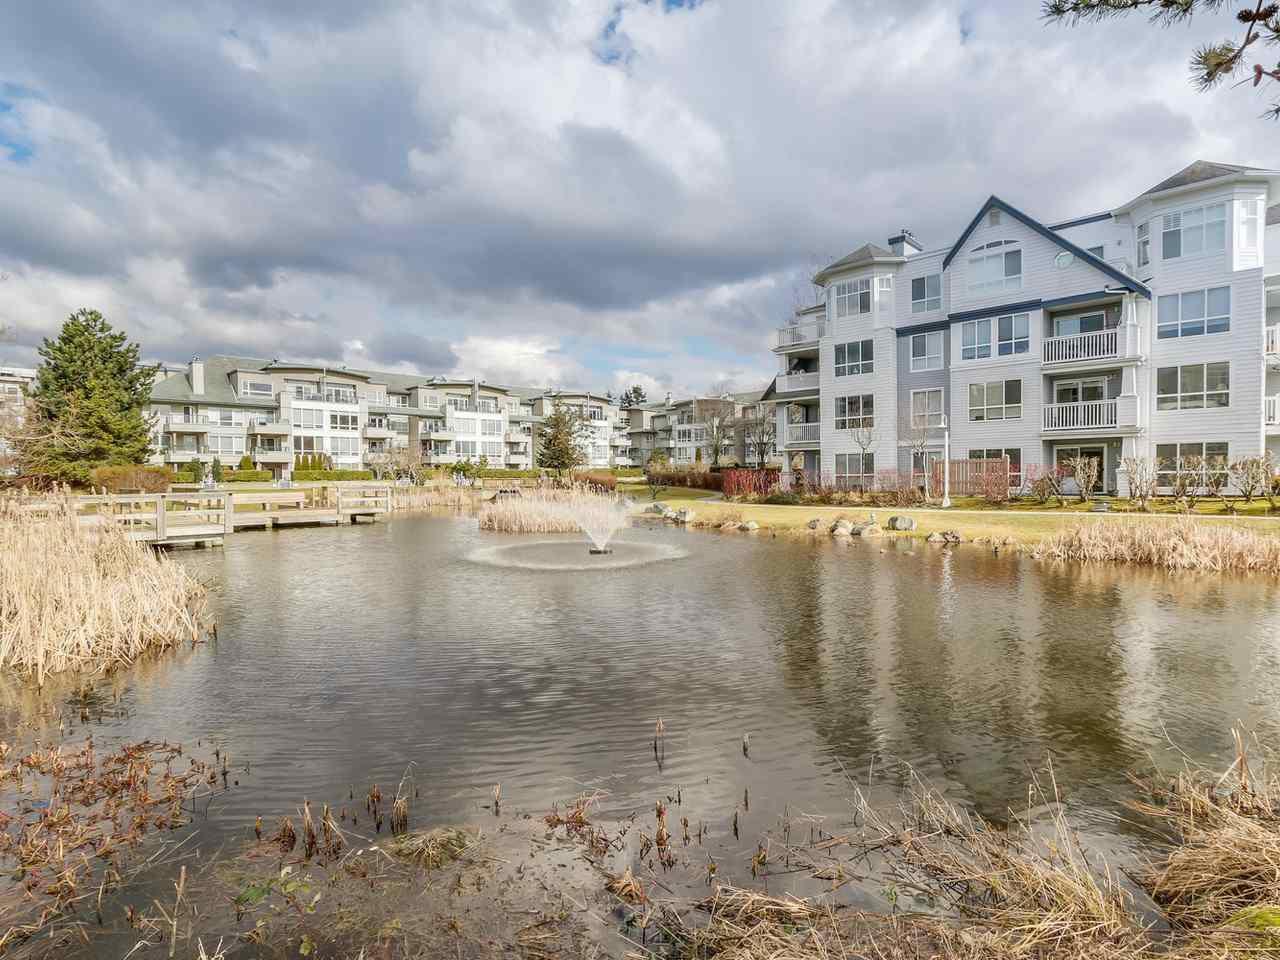 "Main Photo: 128 5800 ANDREWS Road in Richmond: Steveston South Condo for sale in ""THE VILLAS"" : MLS®# R2142147"